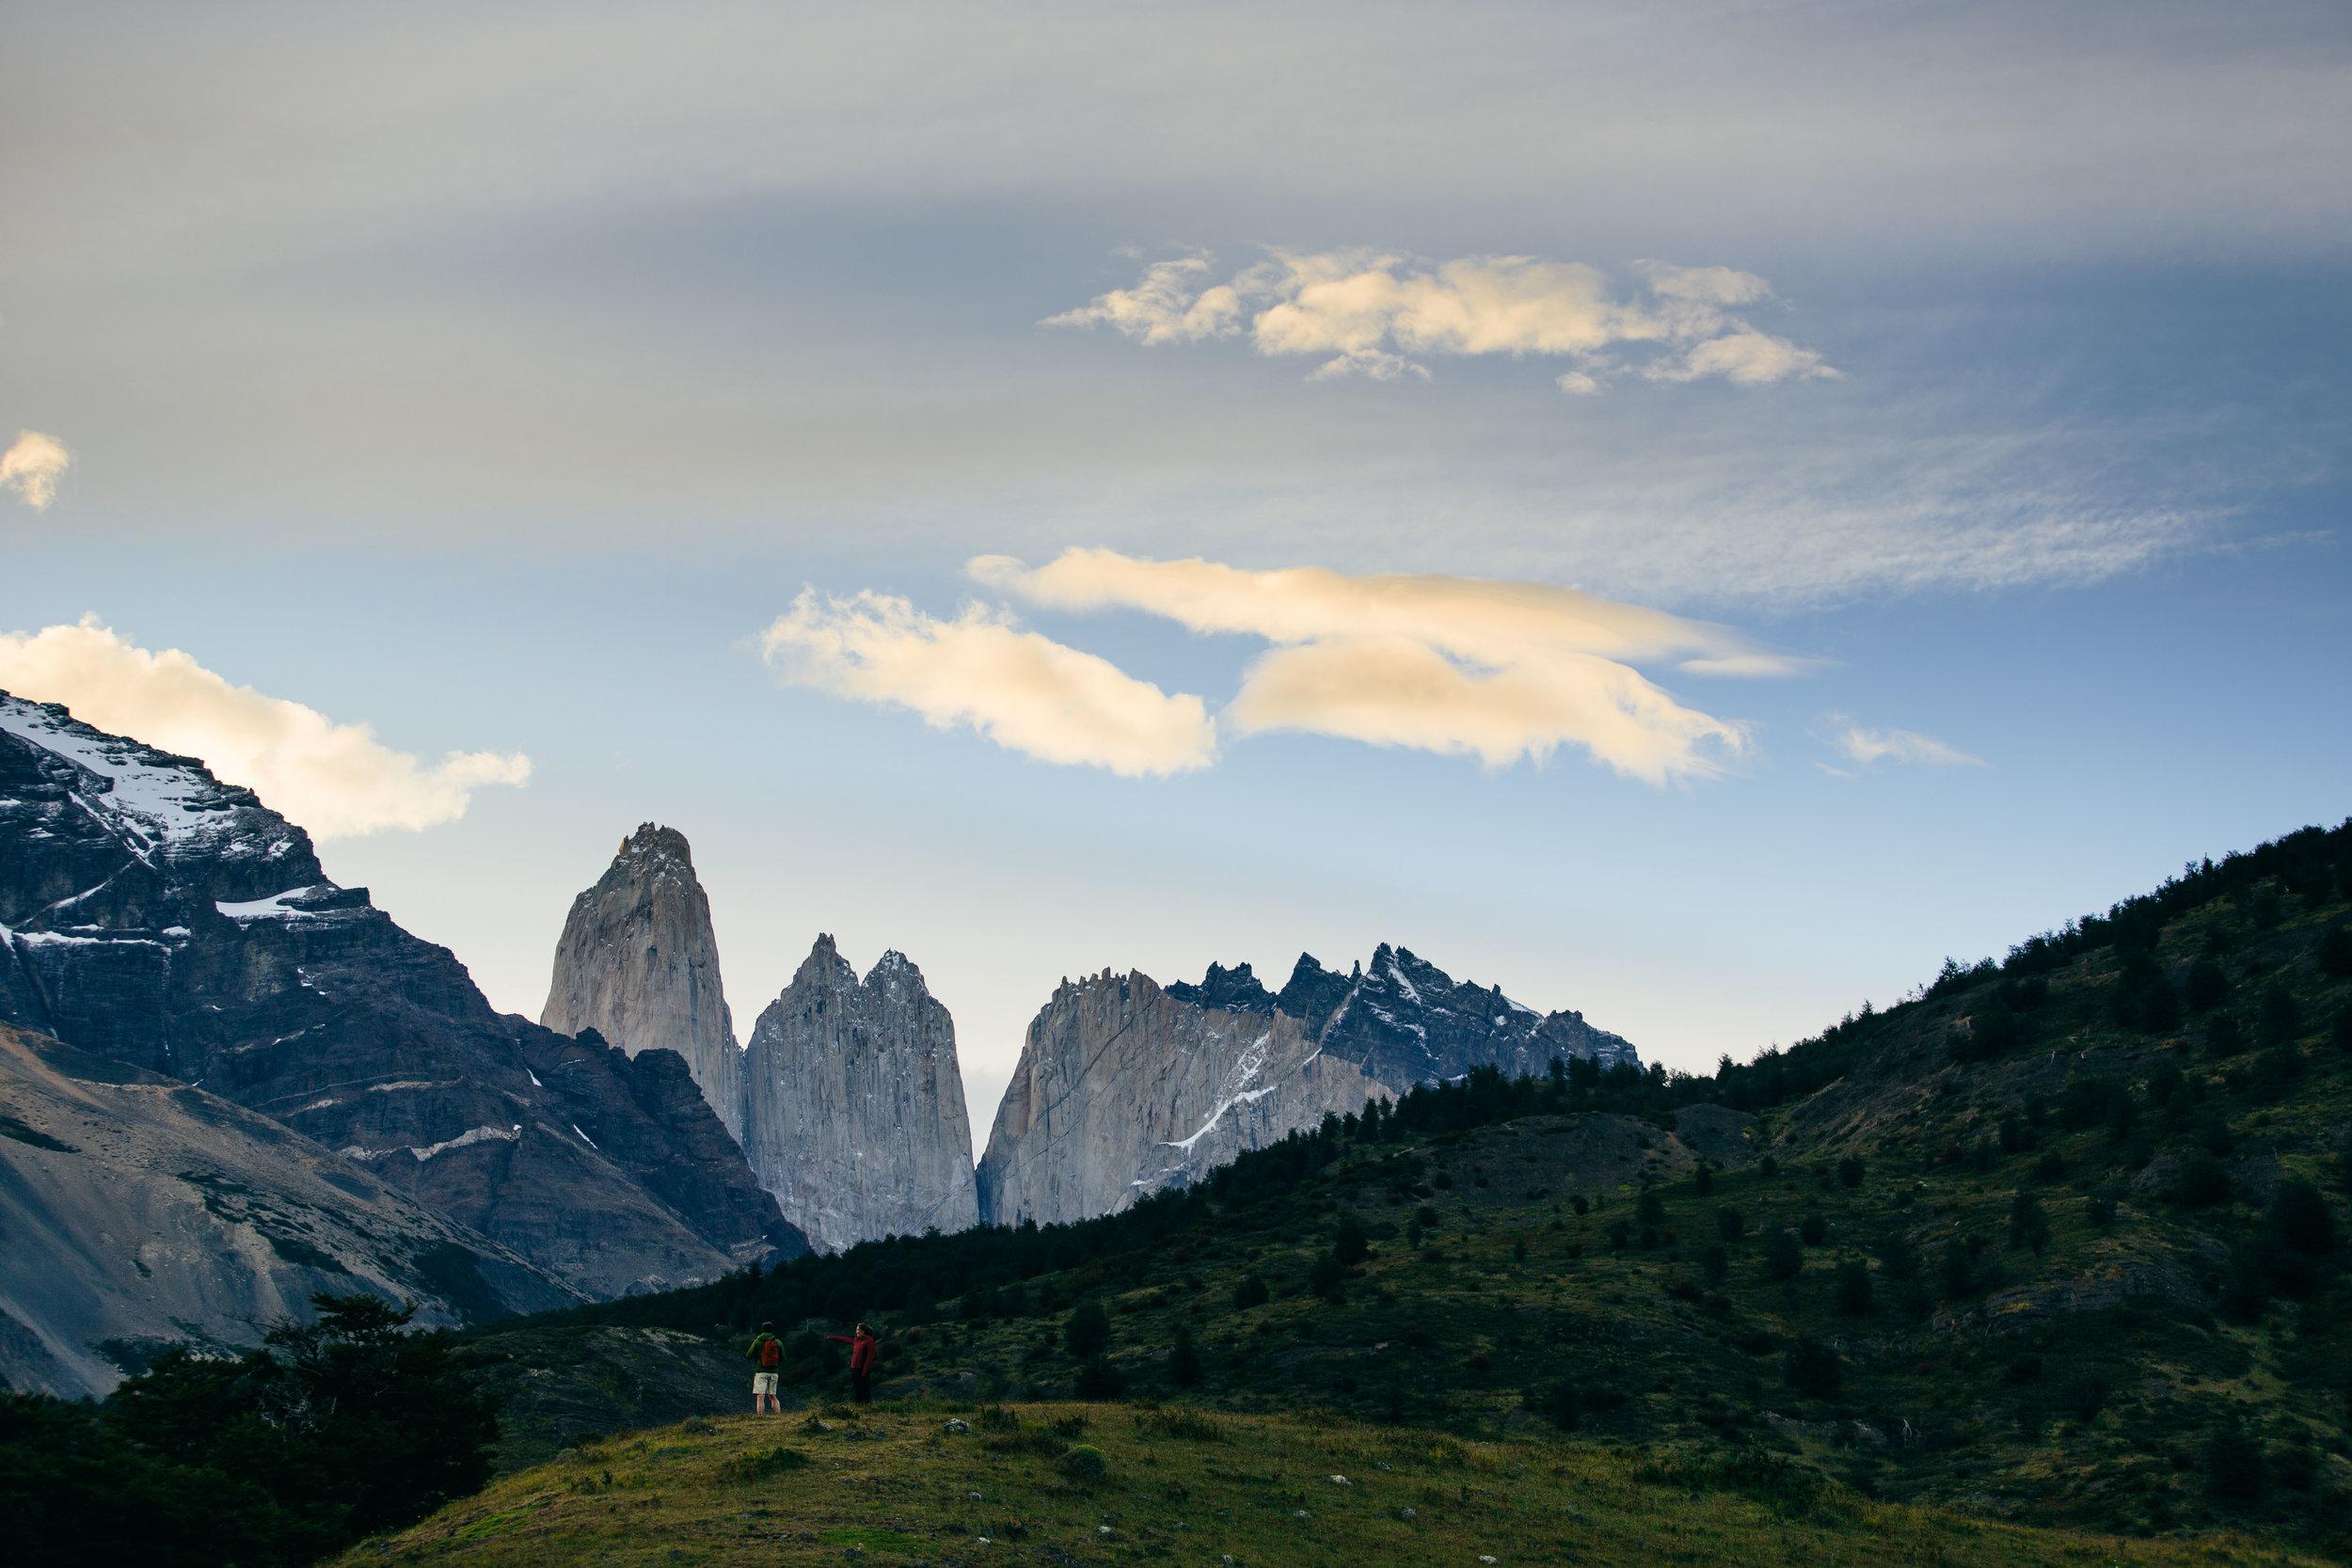 patagonia_2014-1-5.jpg